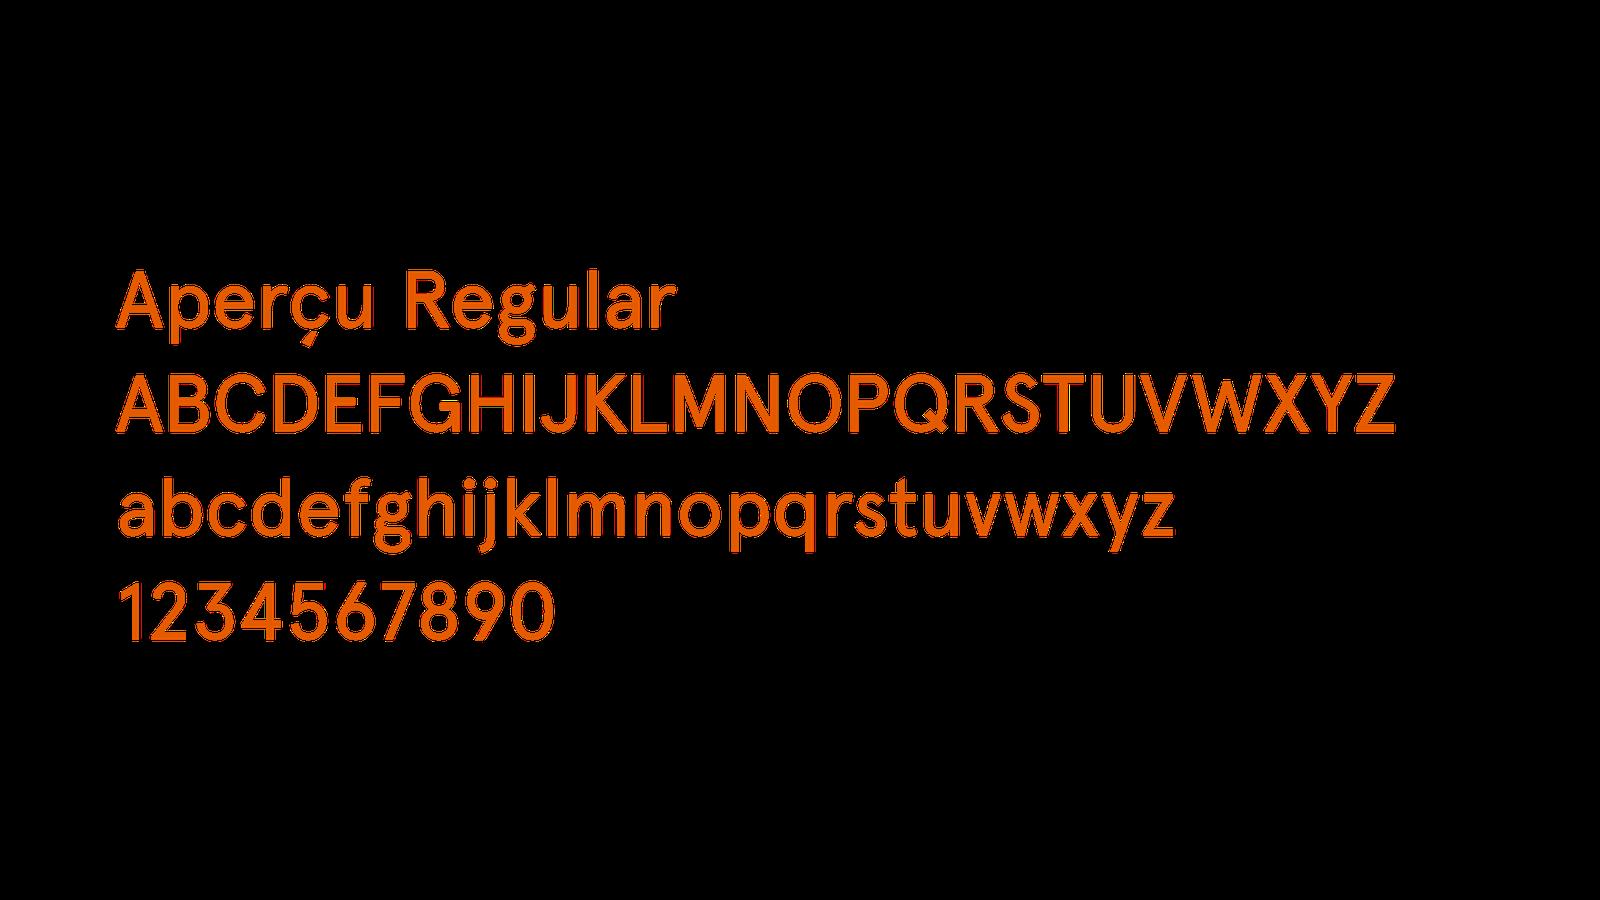 Apercu Regular